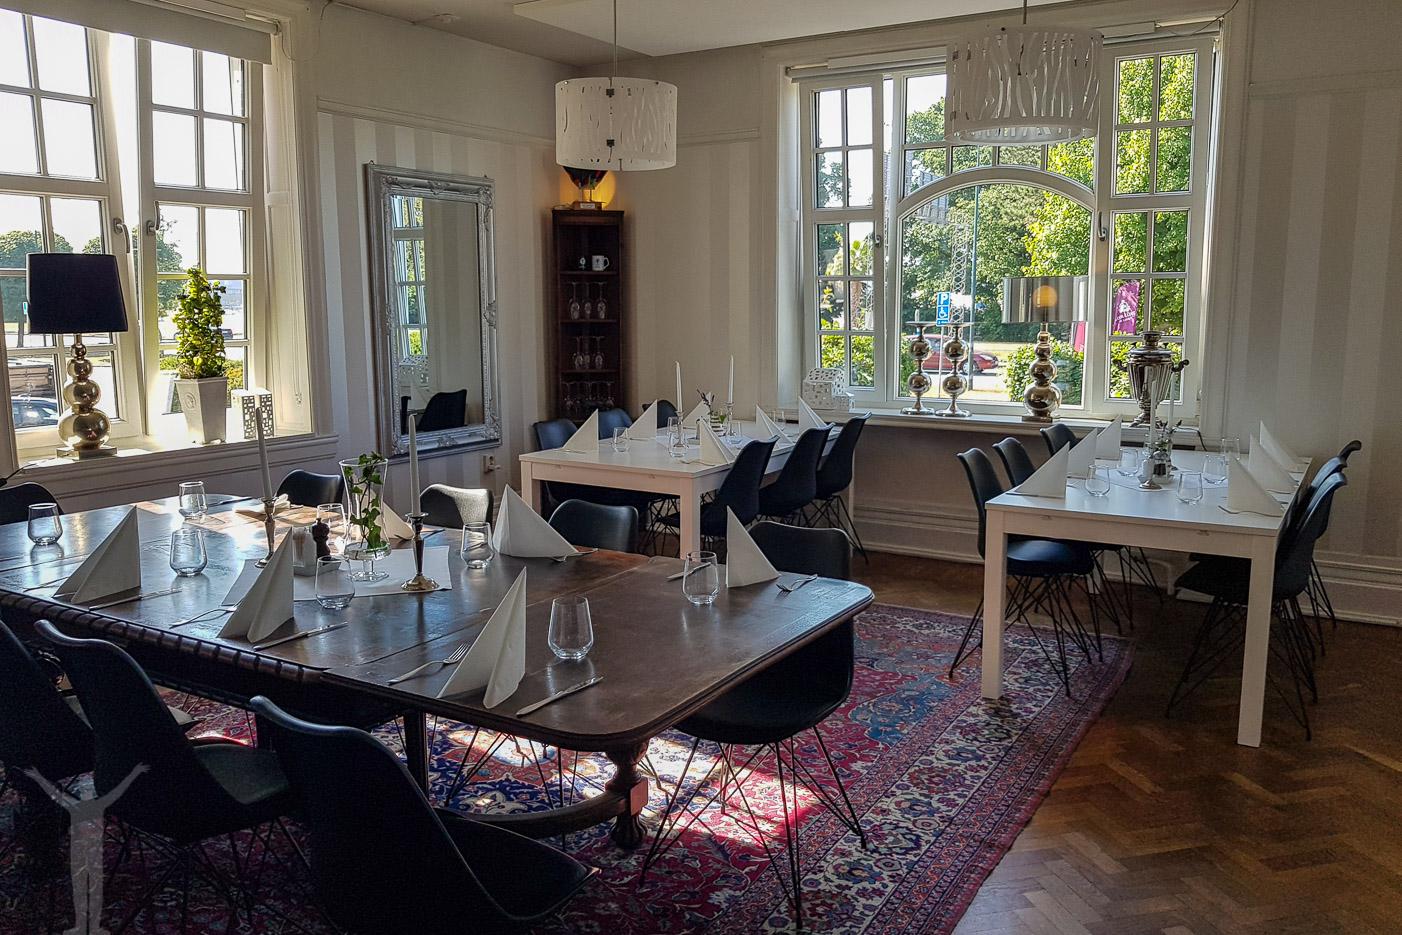 Middagsrum på Dannegården i Trelleborg